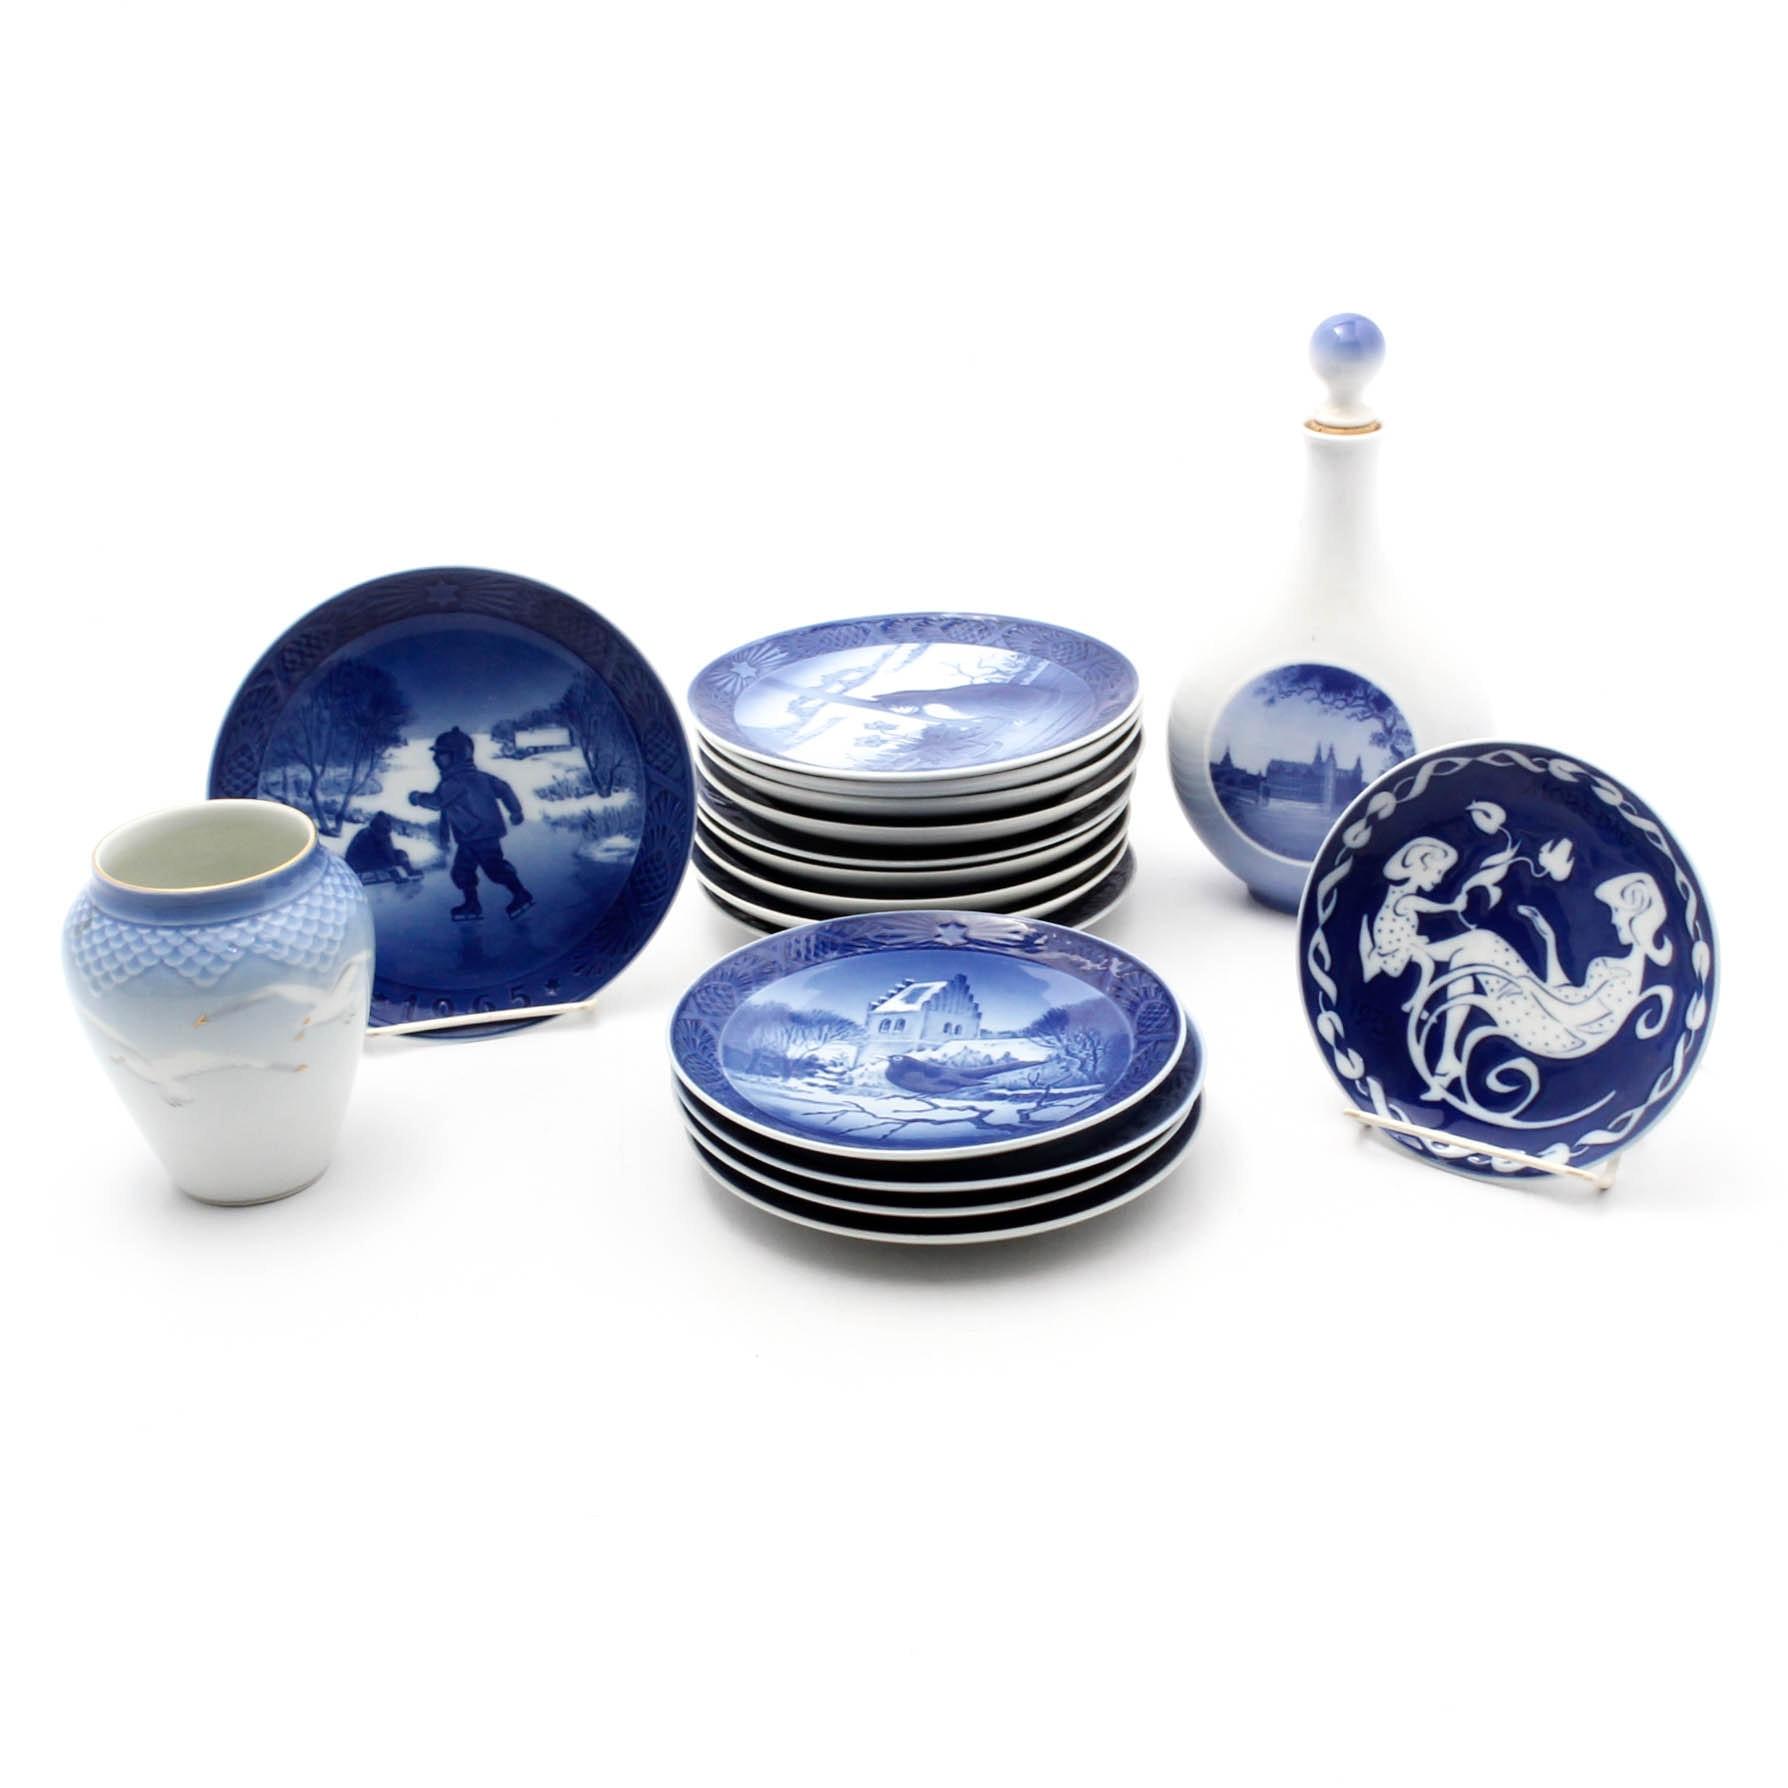 Royal Copenhagen Collector Plates, Decanter, and Vase